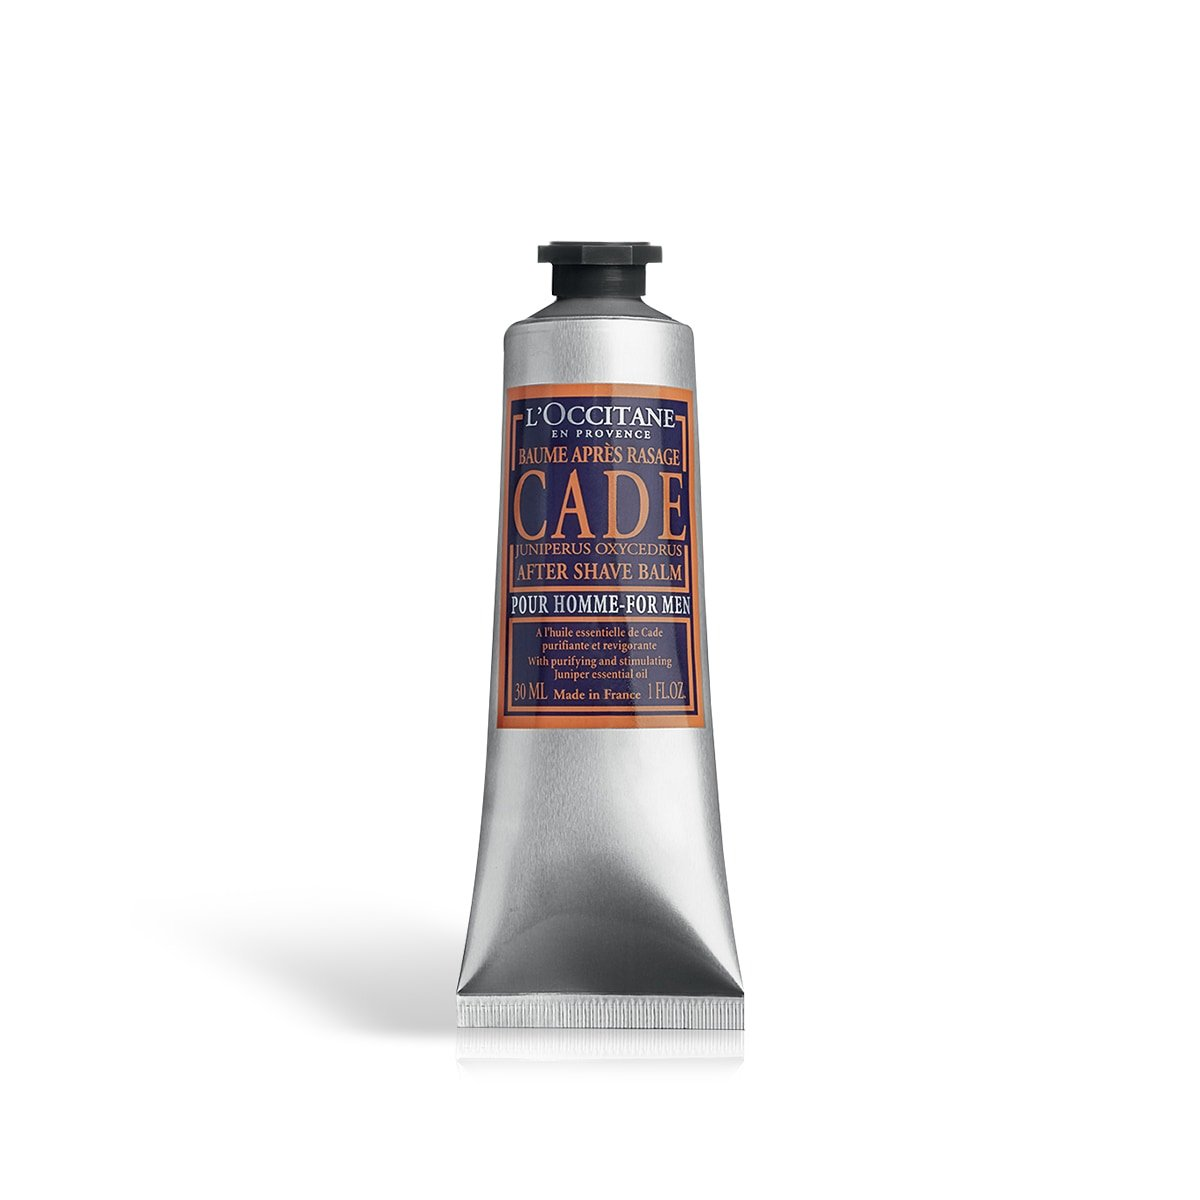 Bálsamo After-Shave Cade - 30 ml L' OCCITANE